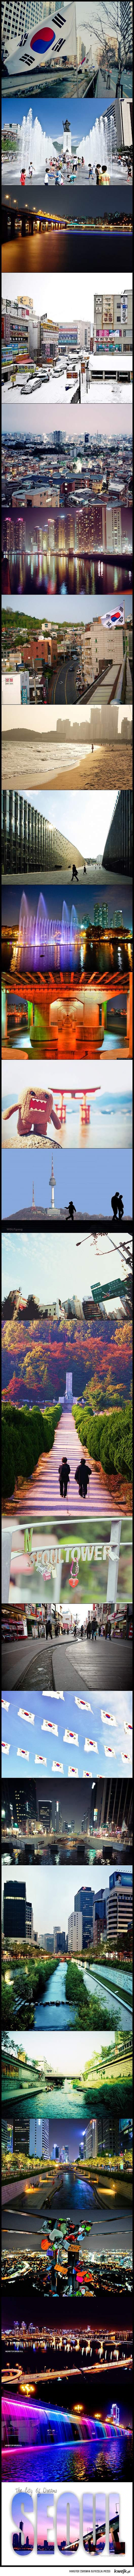 Korea Seoul love